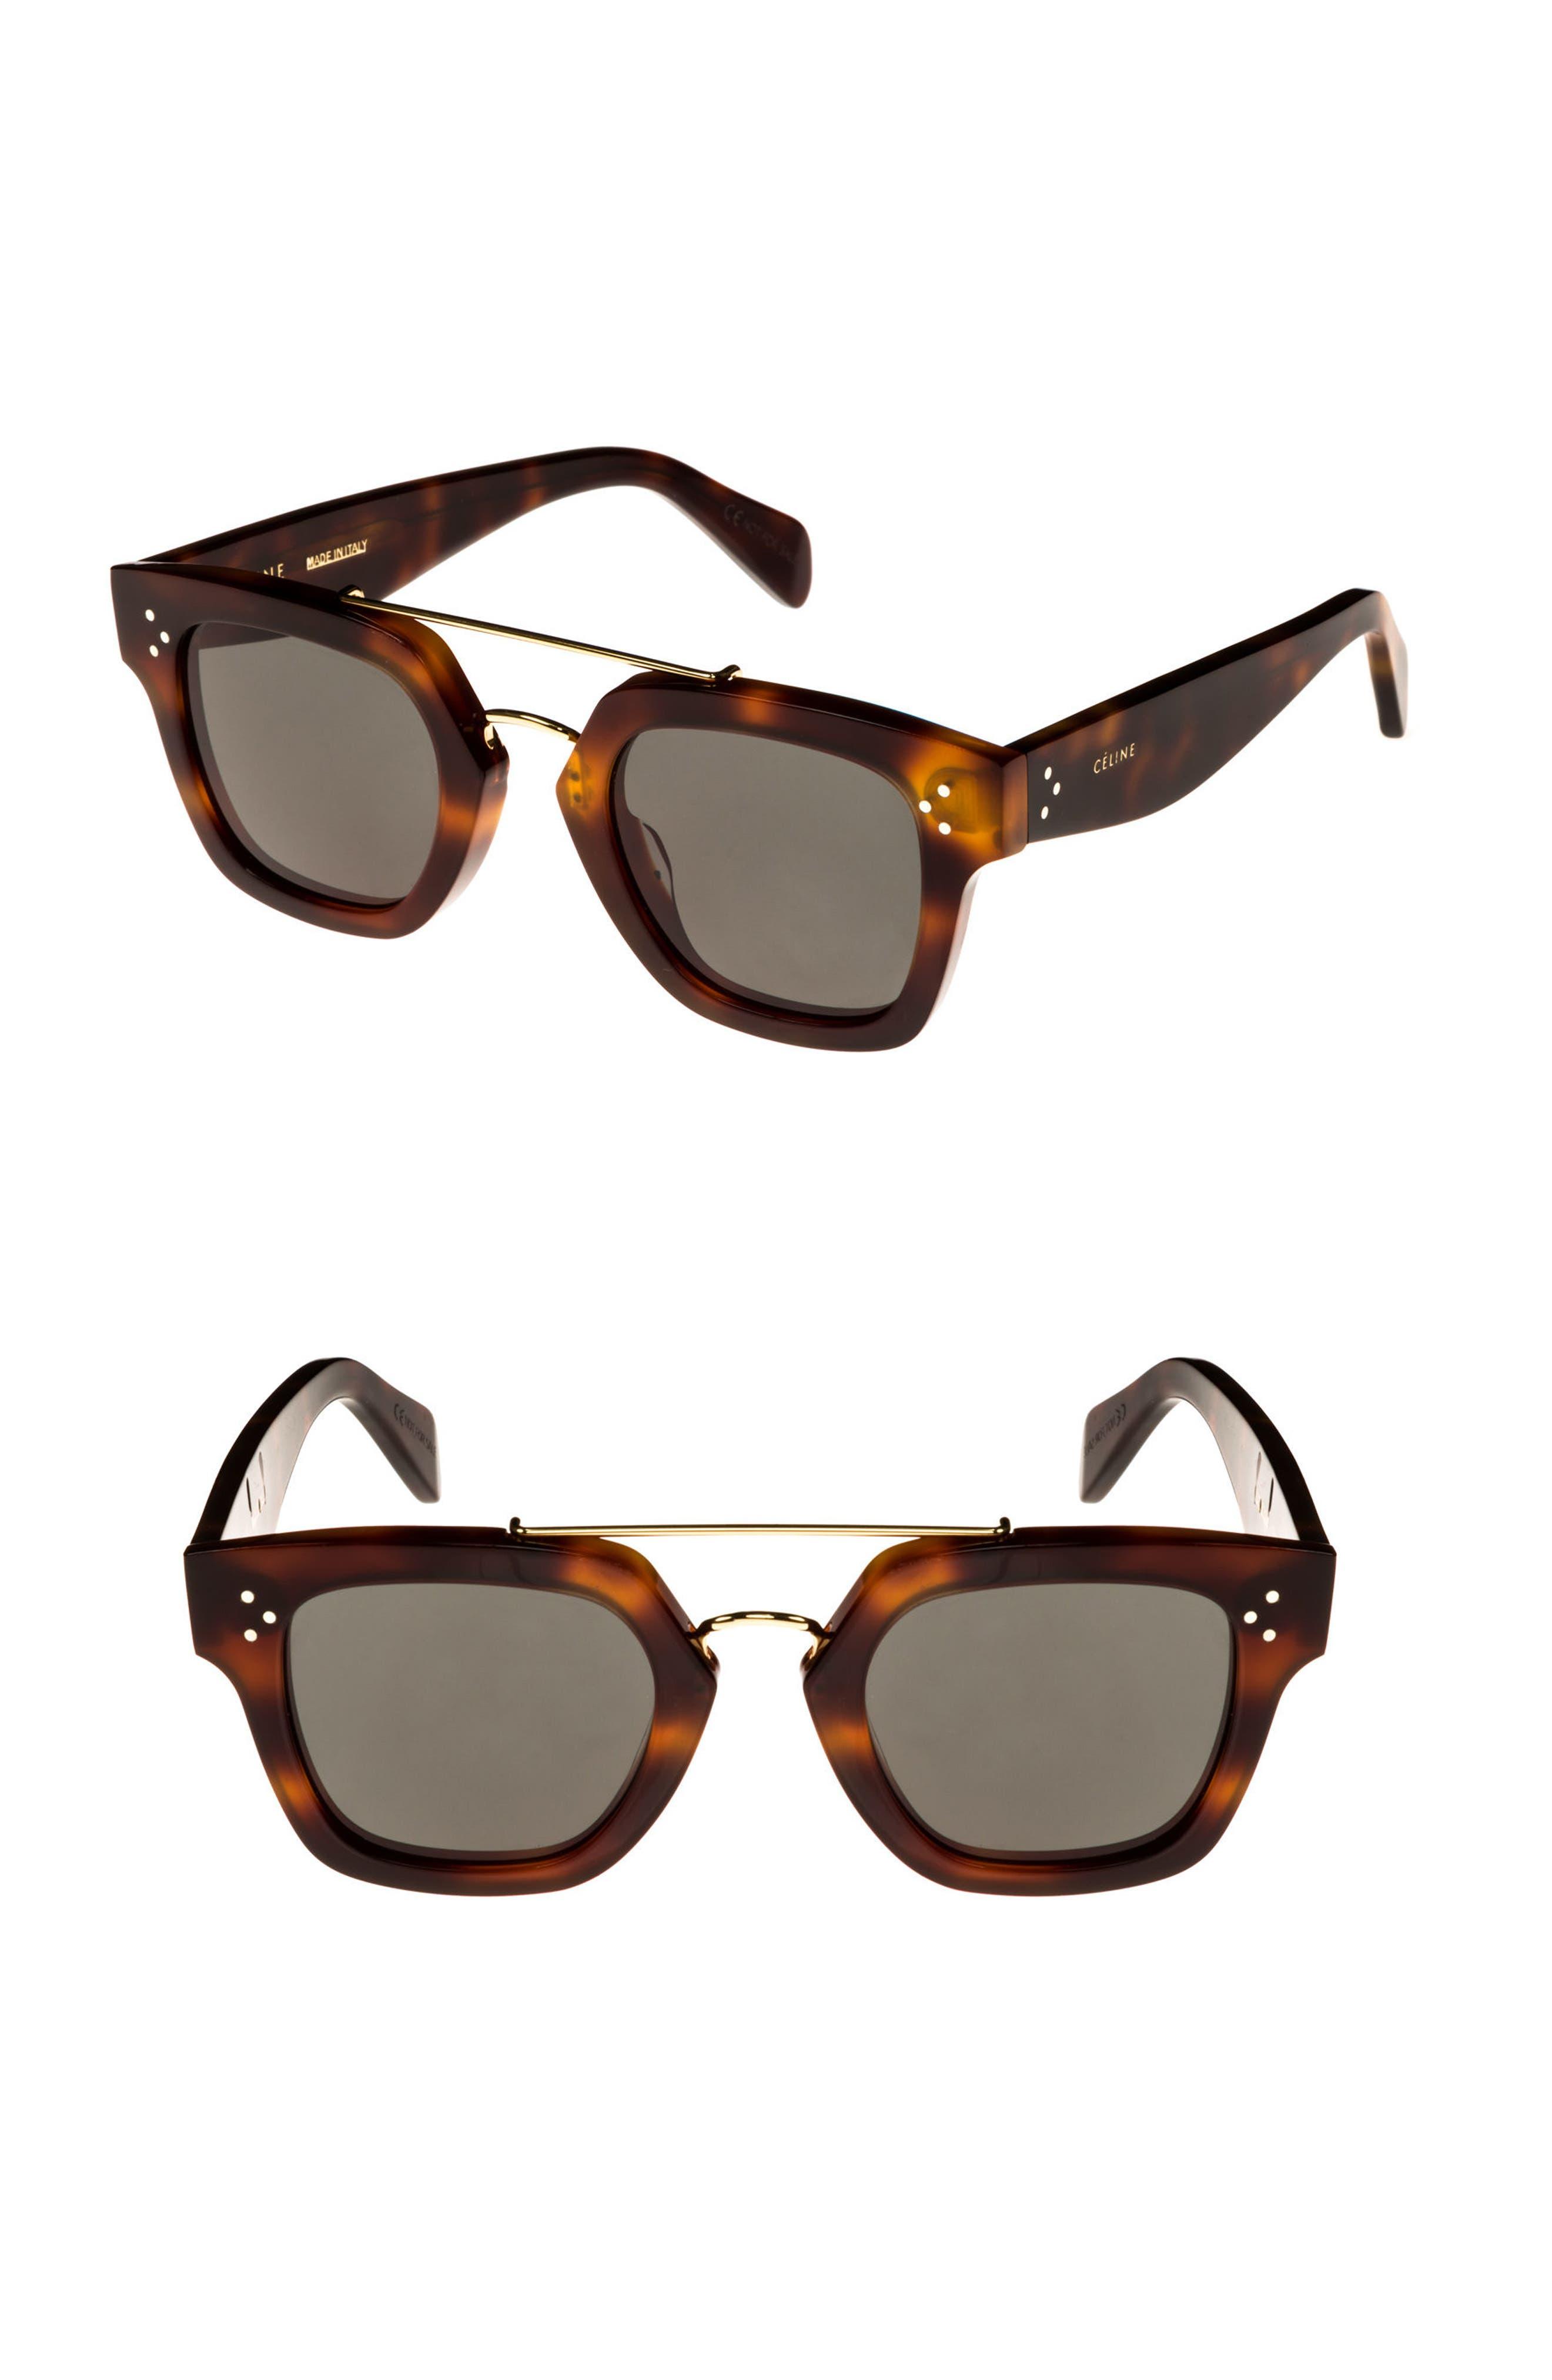 47mm Gradient Square Sunglasses,                             Main thumbnail 1, color,                             BLONDE HAVANA/ GREEN